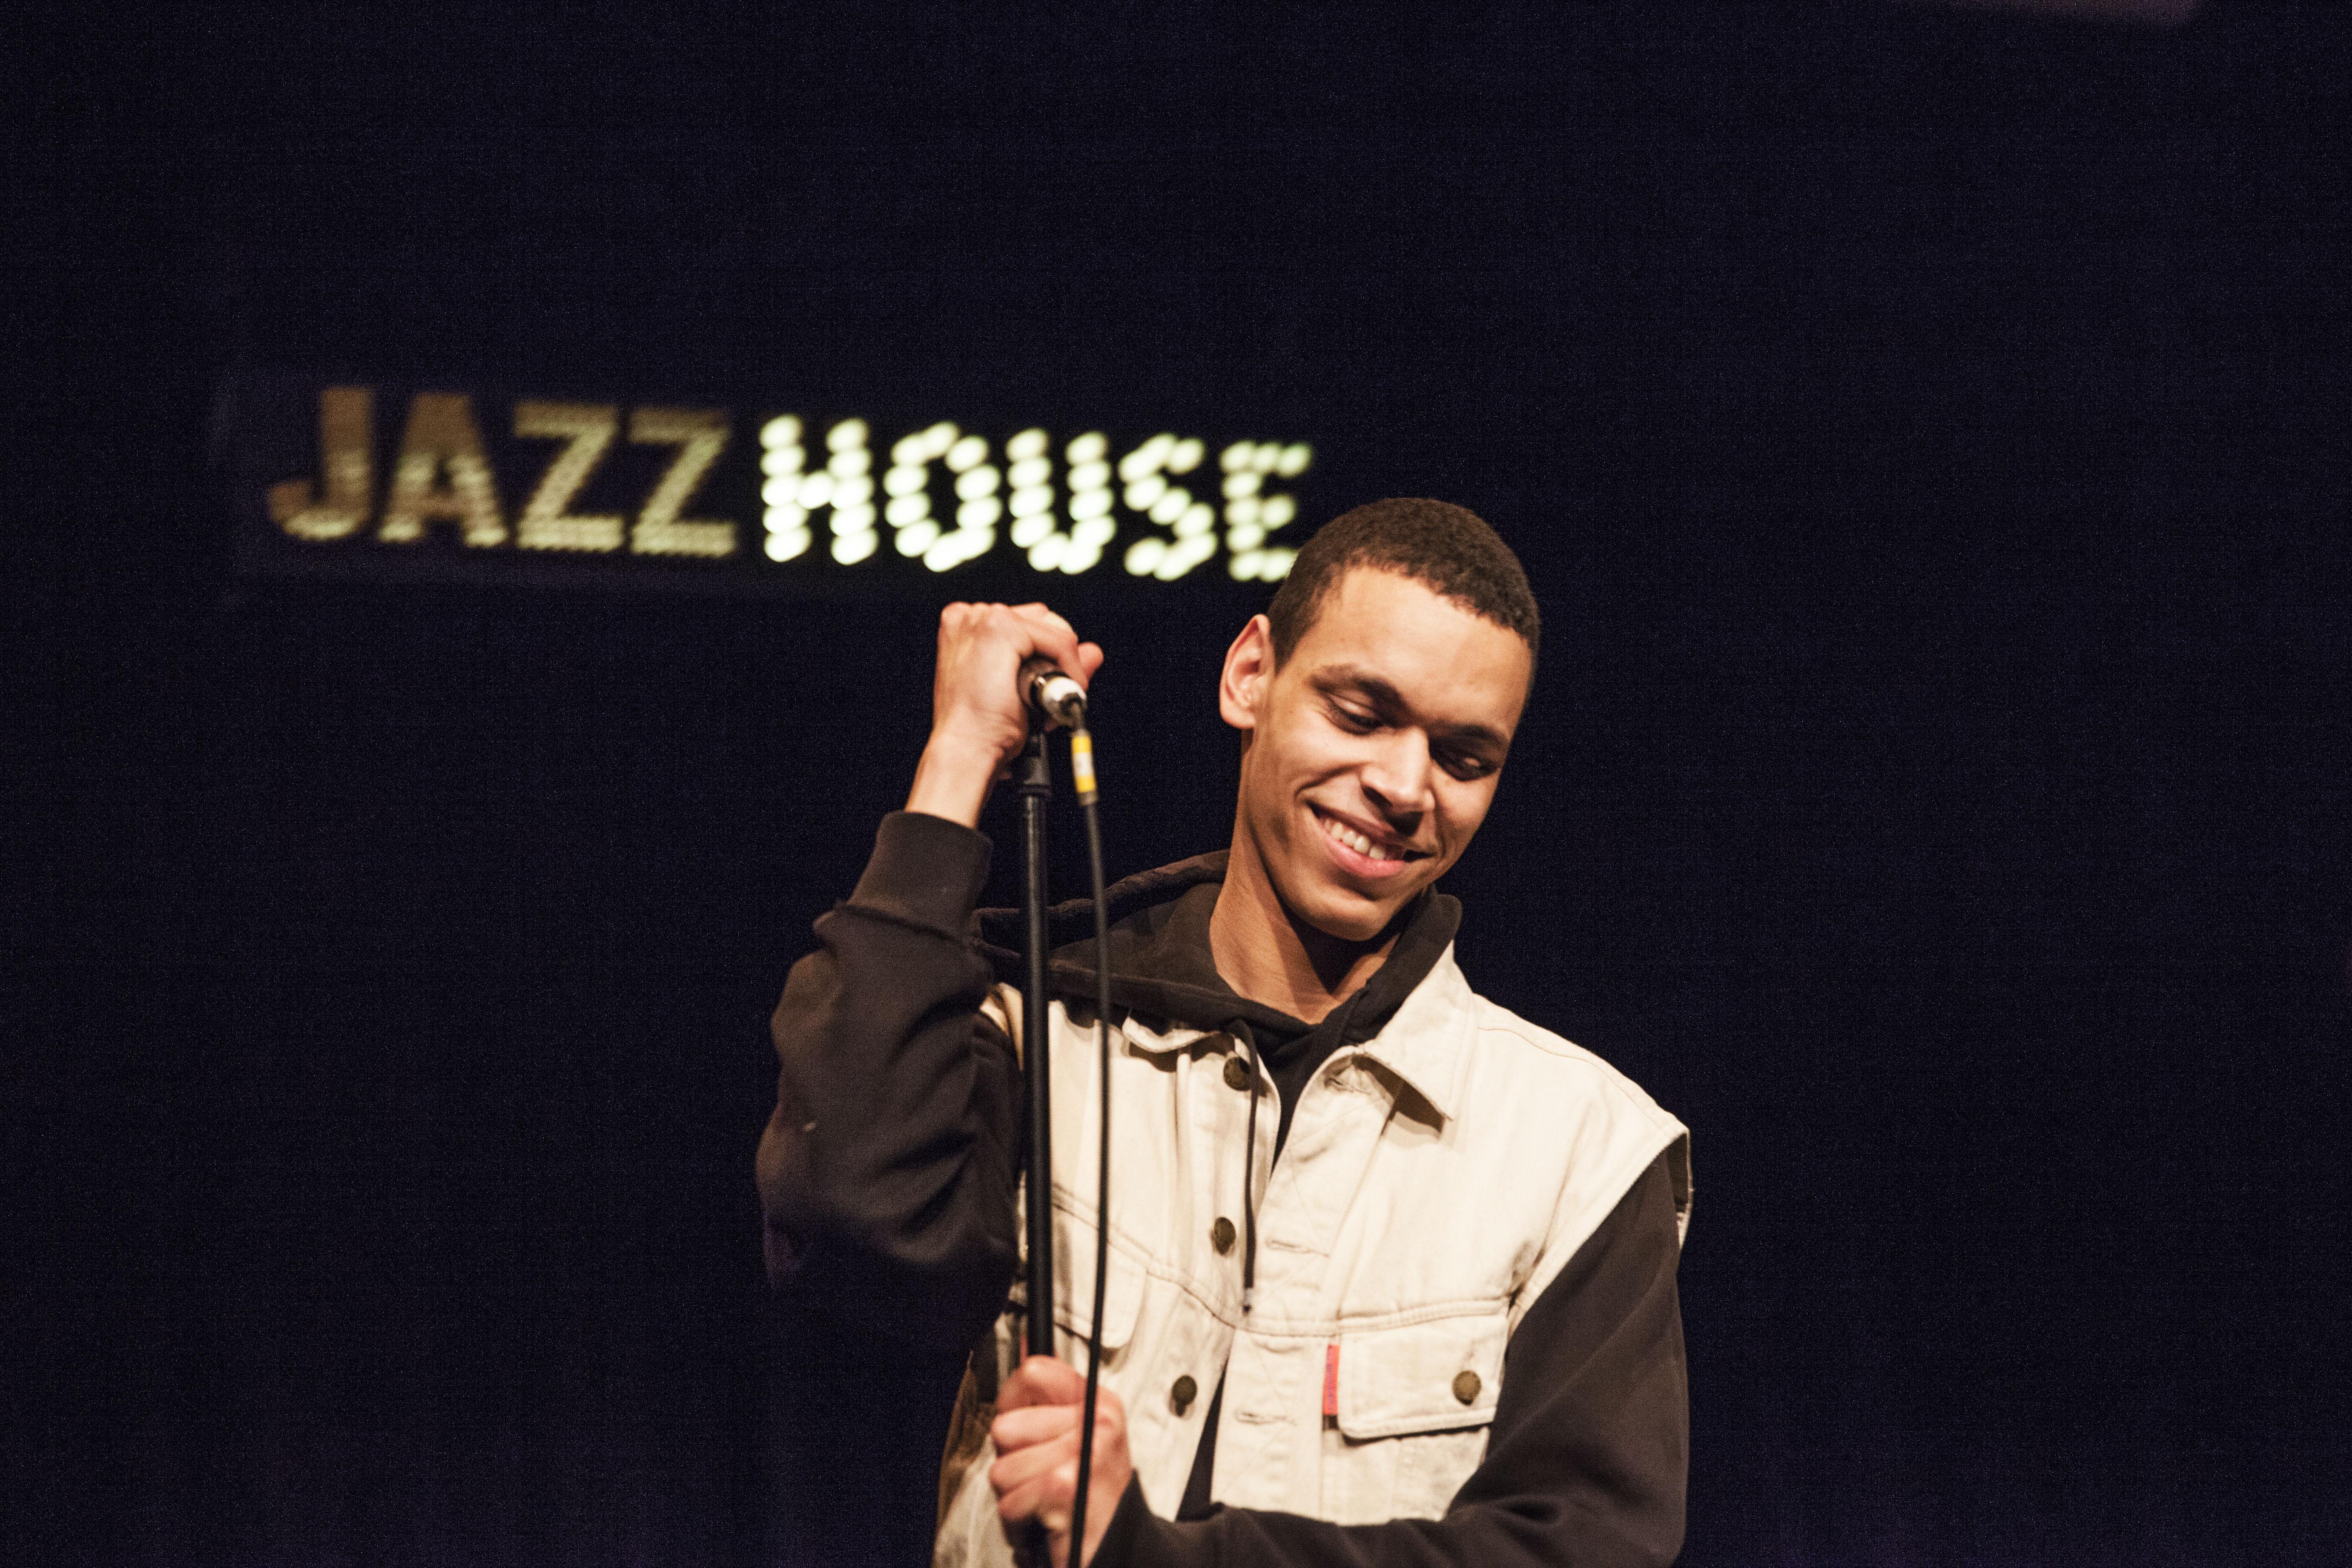 LISS_Jazzhouse_GAFFA_HelenaLundquist_low_4